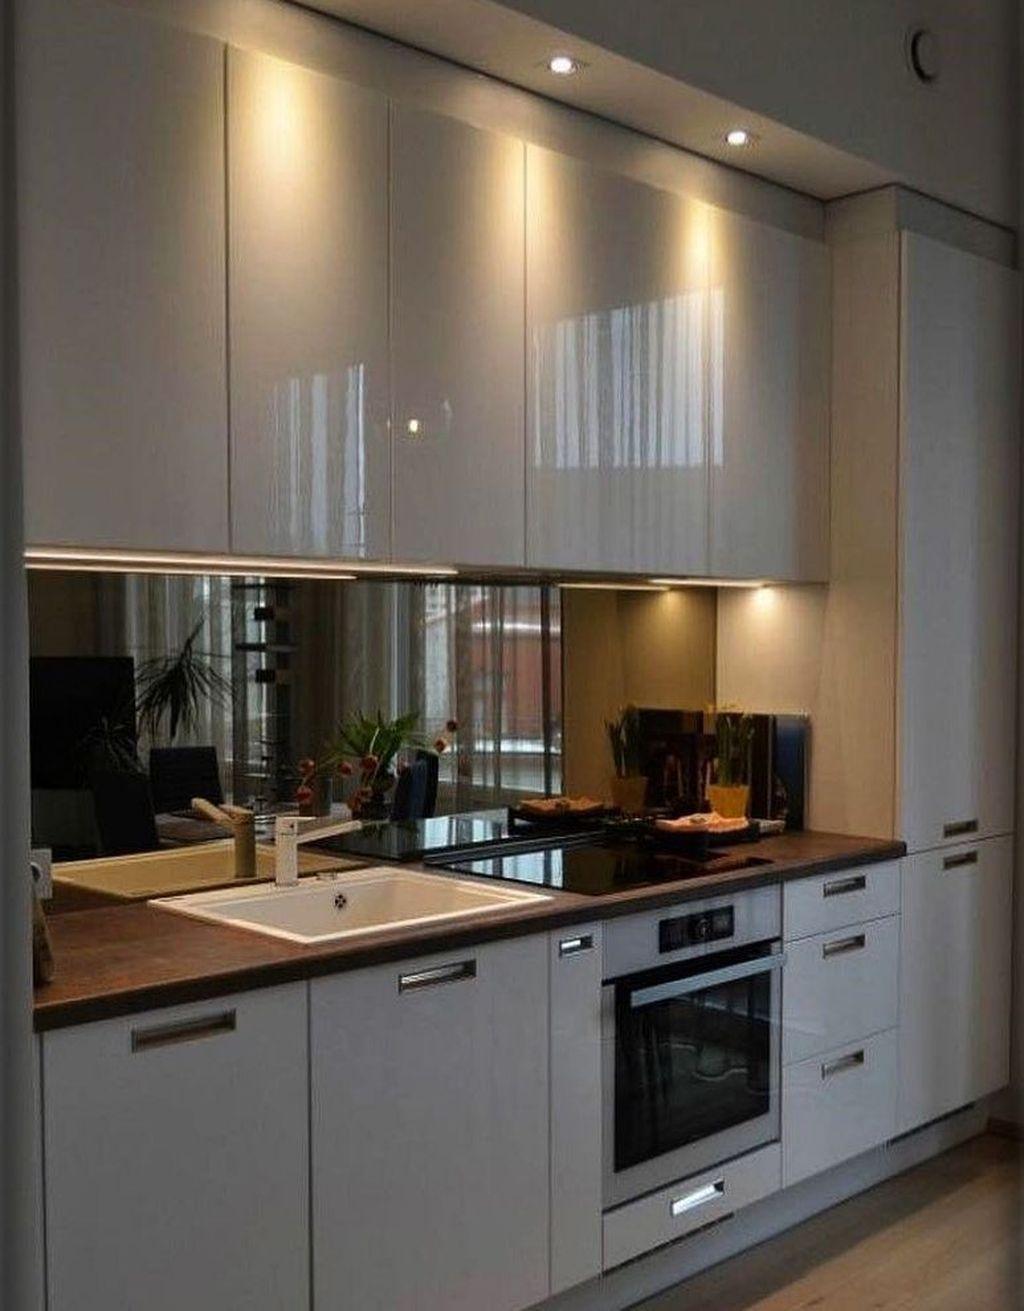 35 Cool Kitchen Design Ideas With Temporary Looks In 2020 Modern Kitchen Renovation Small Kitchen Plans Modern Kitchen